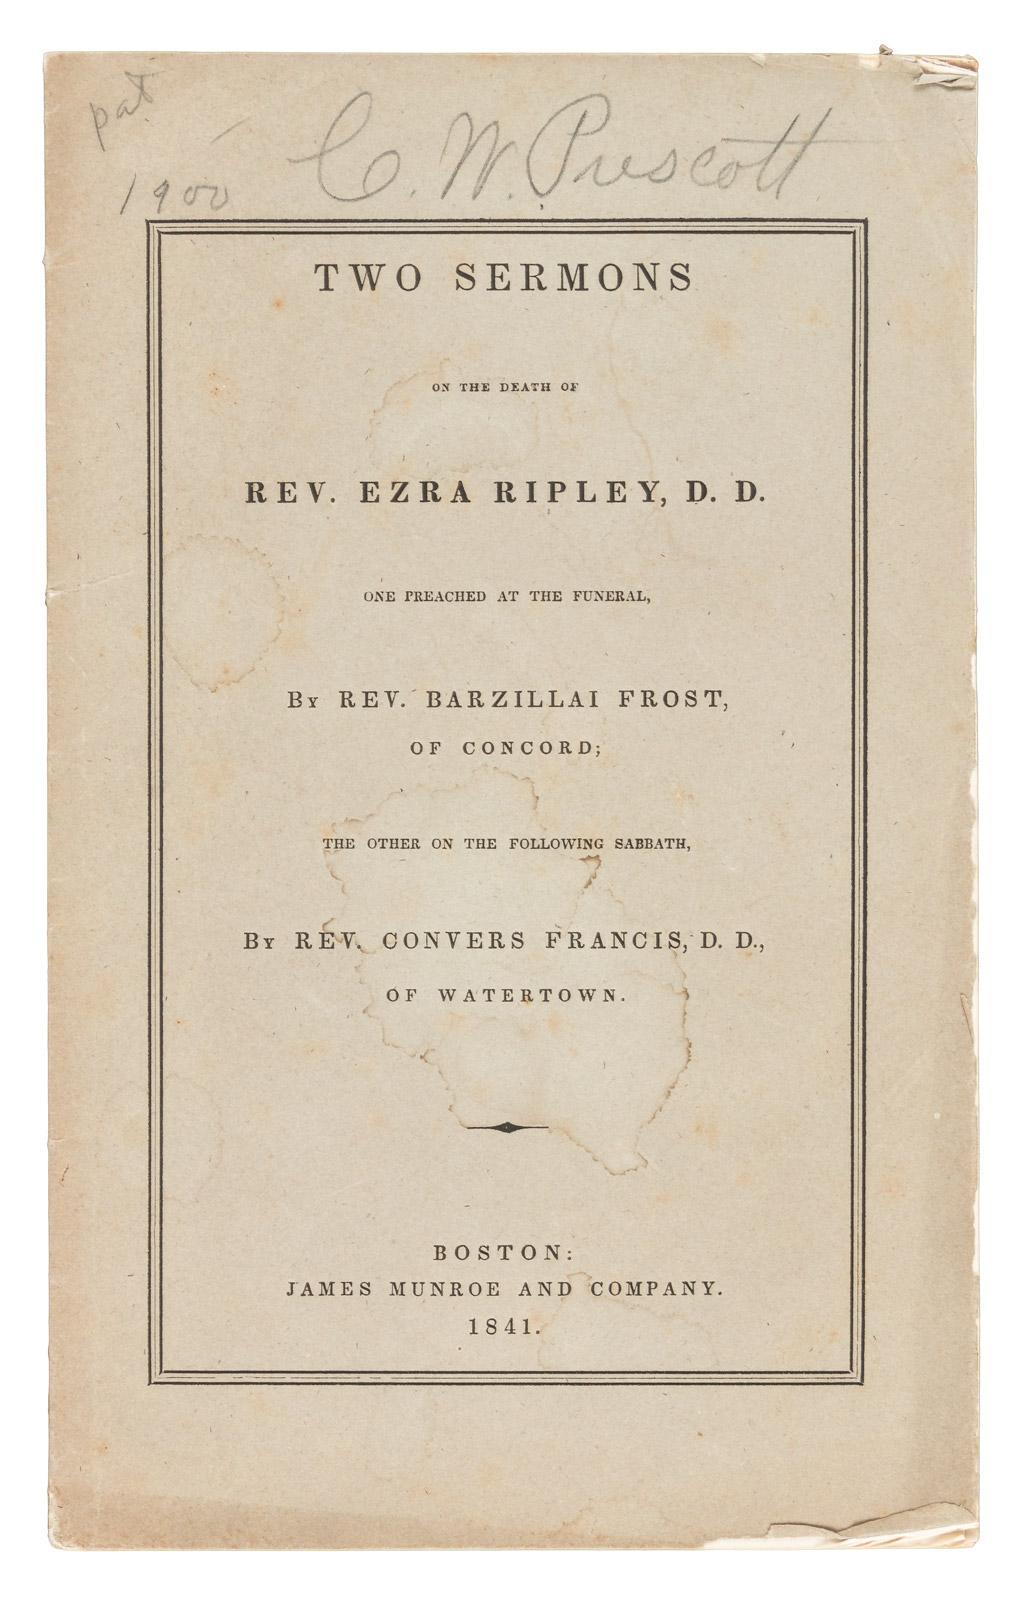 Obituary of Ezra Ripley [in] Two Sermons on the Death of Rev  Ezra